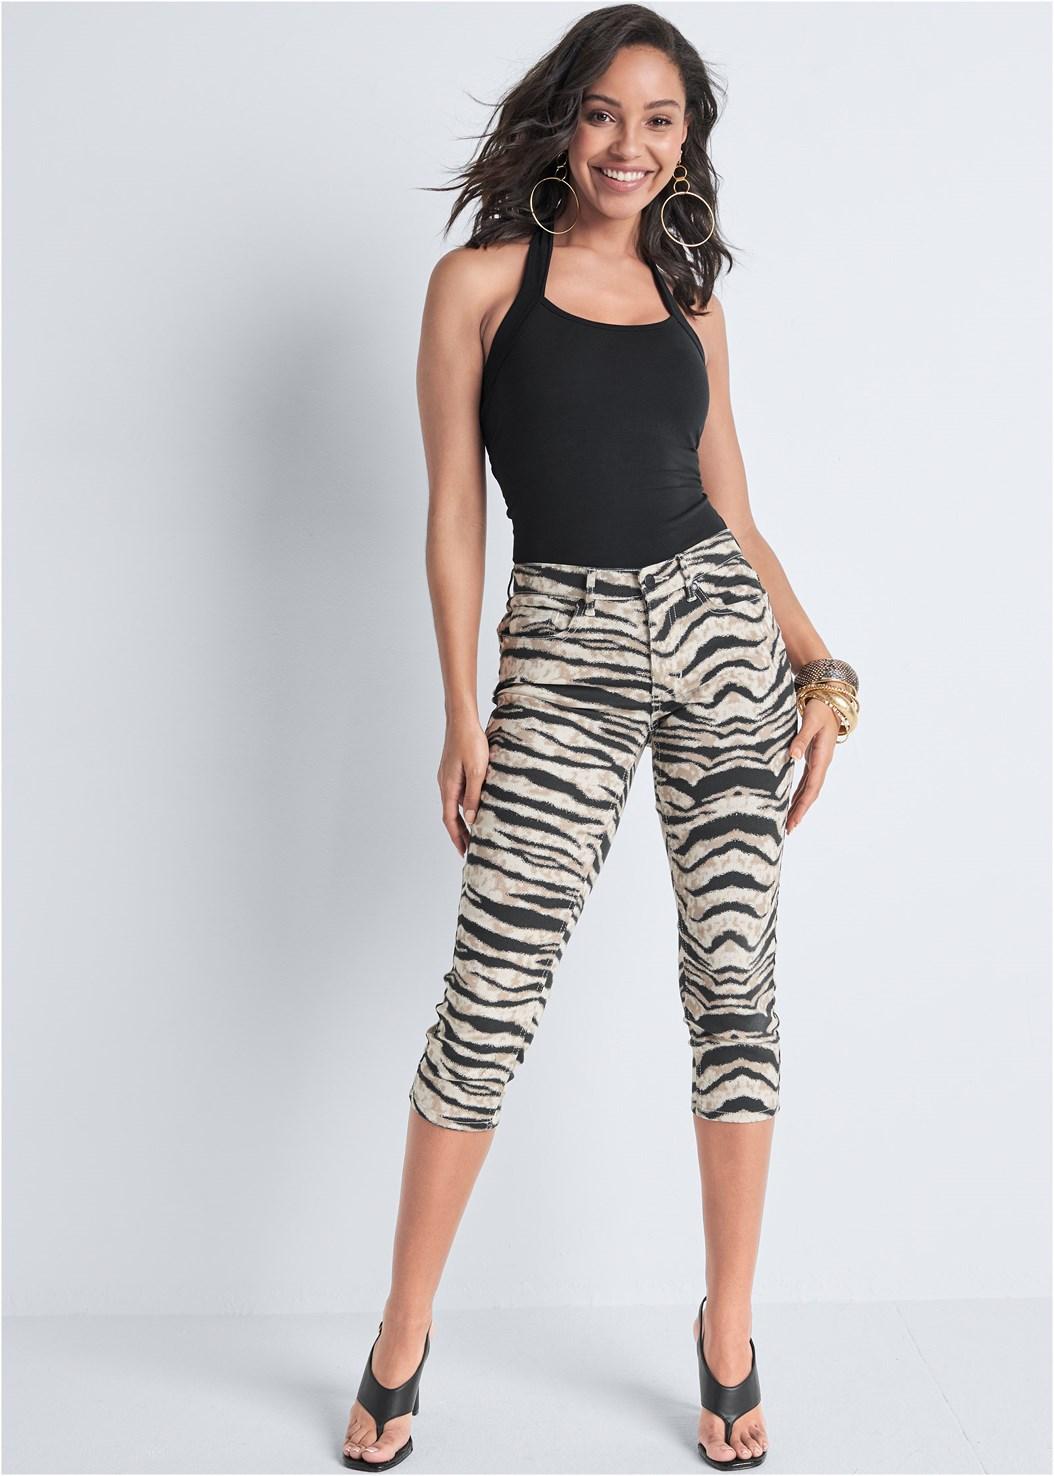 Color Capri Jeans,Easy Halter Top